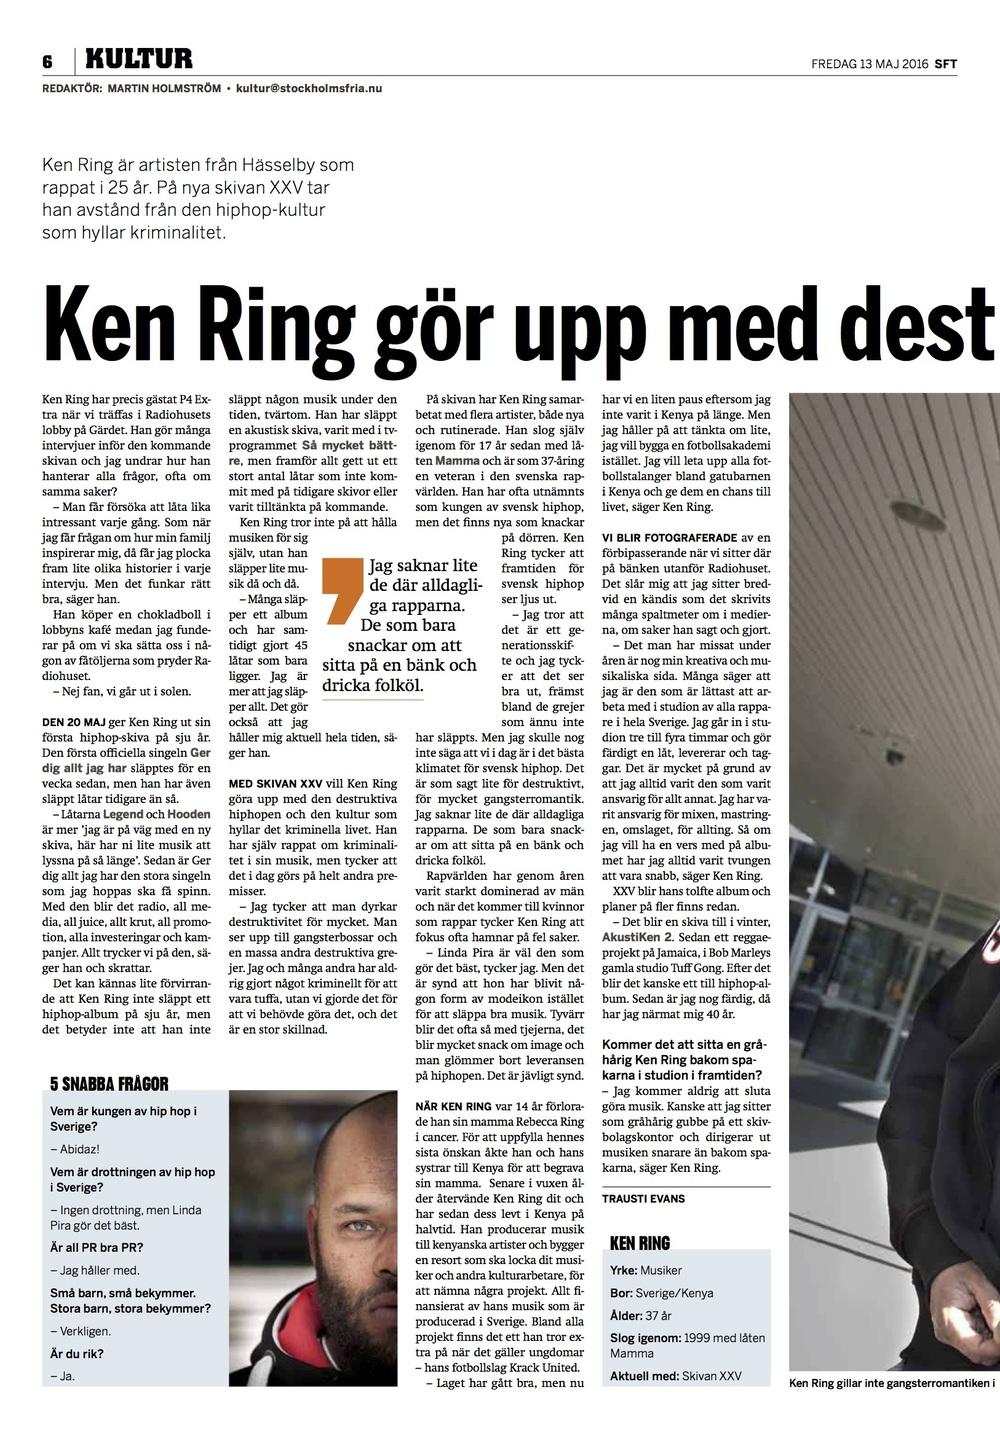 Stockholm fria sid 1 - Ken Ring.jpg